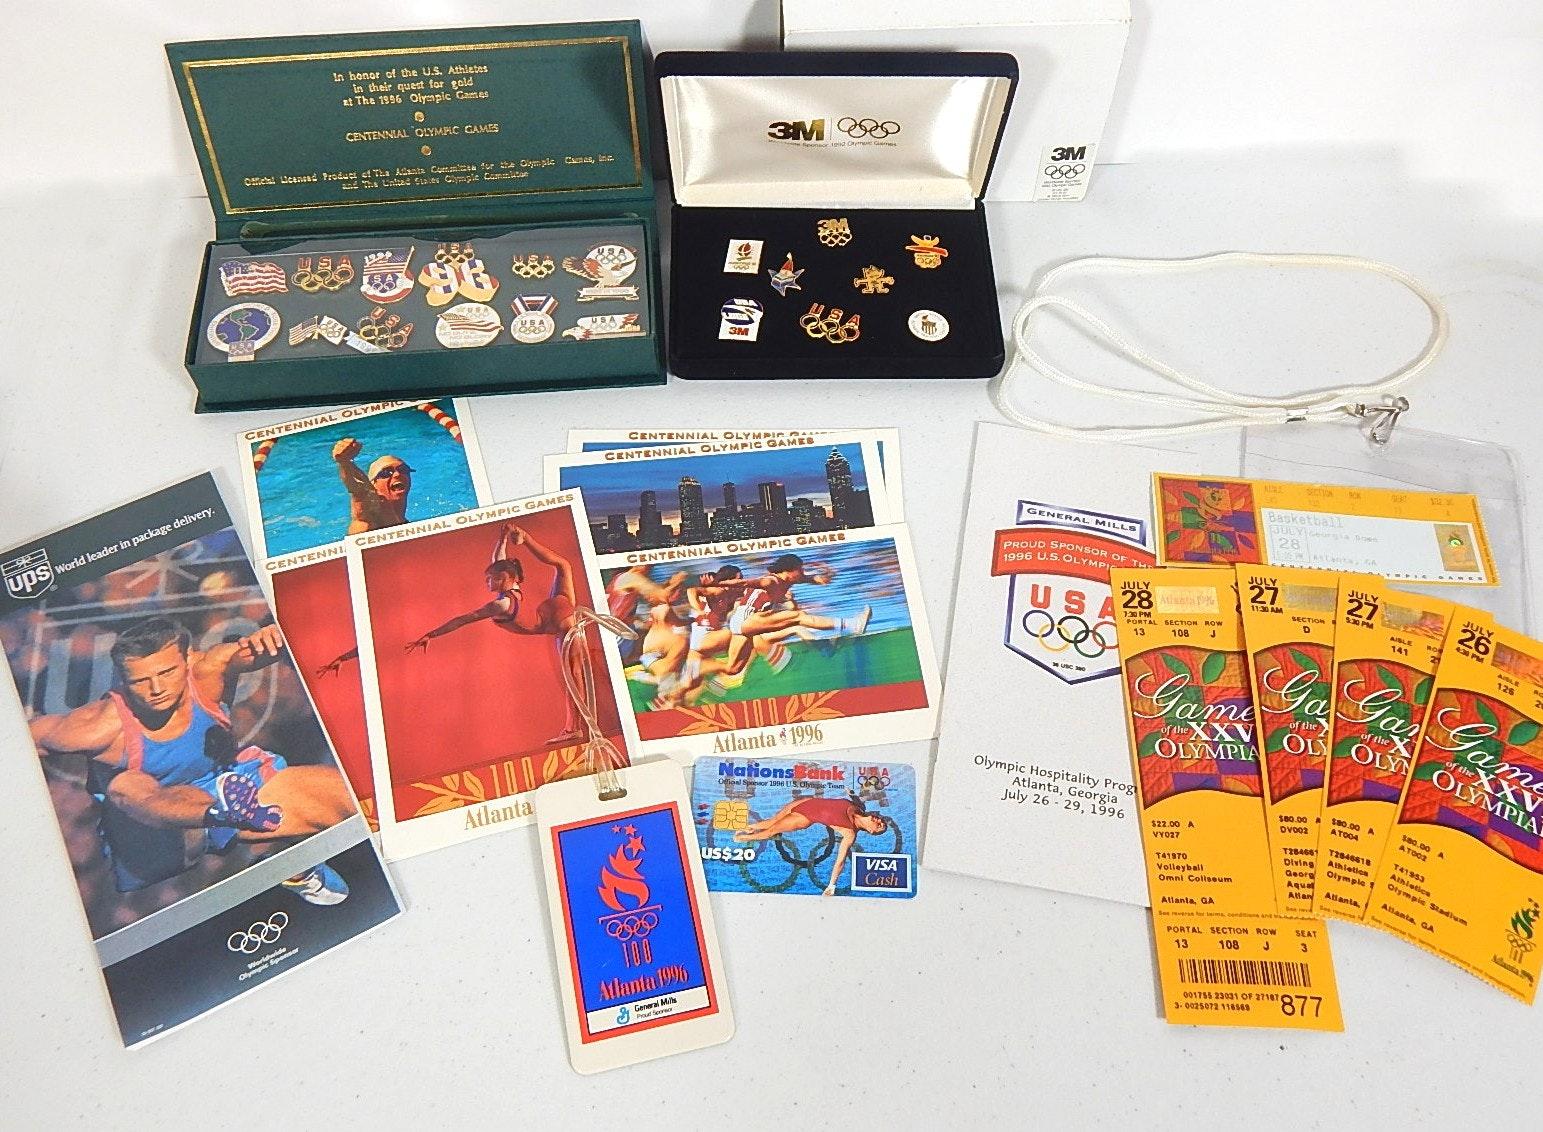 "1996 ""Atlanta"" U.S. Olympics Memorabilia Including Pins, Tickets, and More"